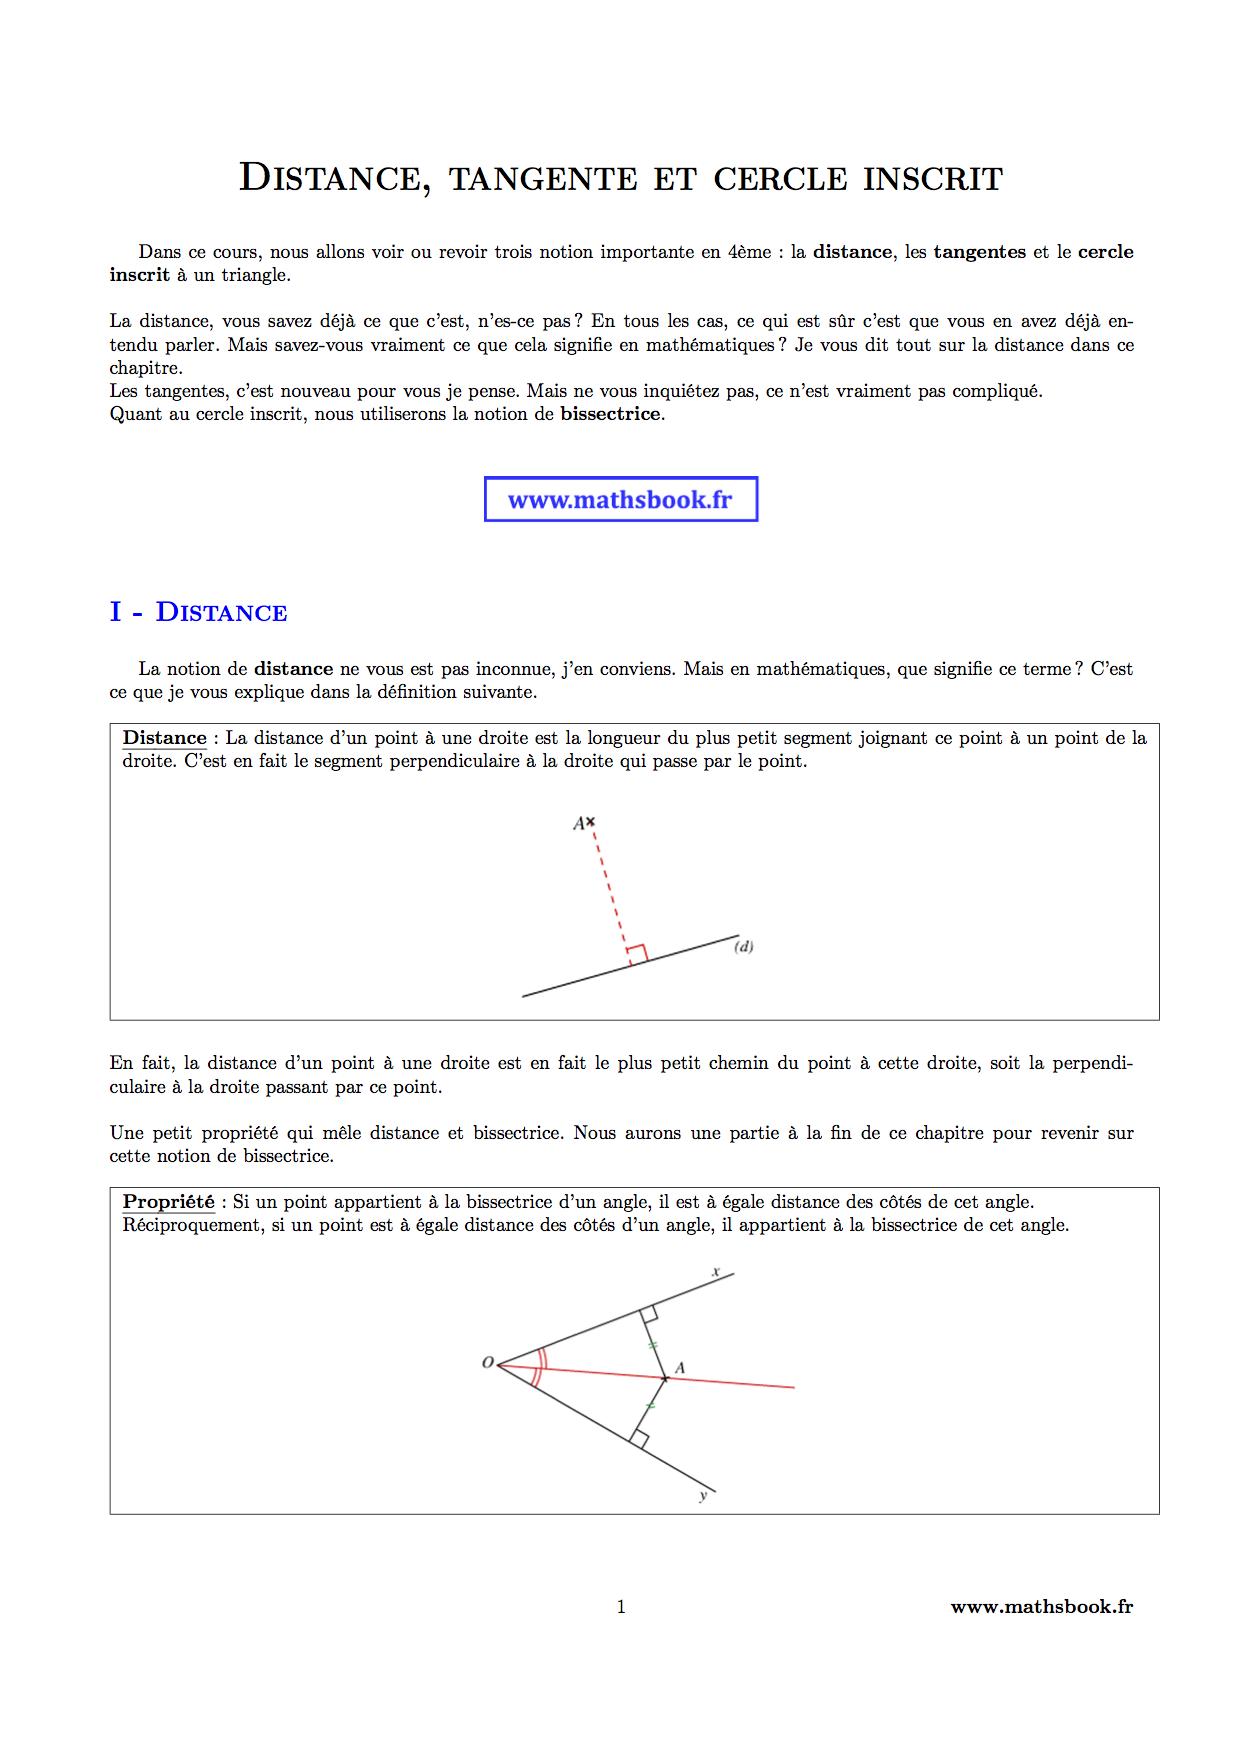 distance tangente et cercle inscrit cours pdf imprimer maths 4 me. Black Bedroom Furniture Sets. Home Design Ideas